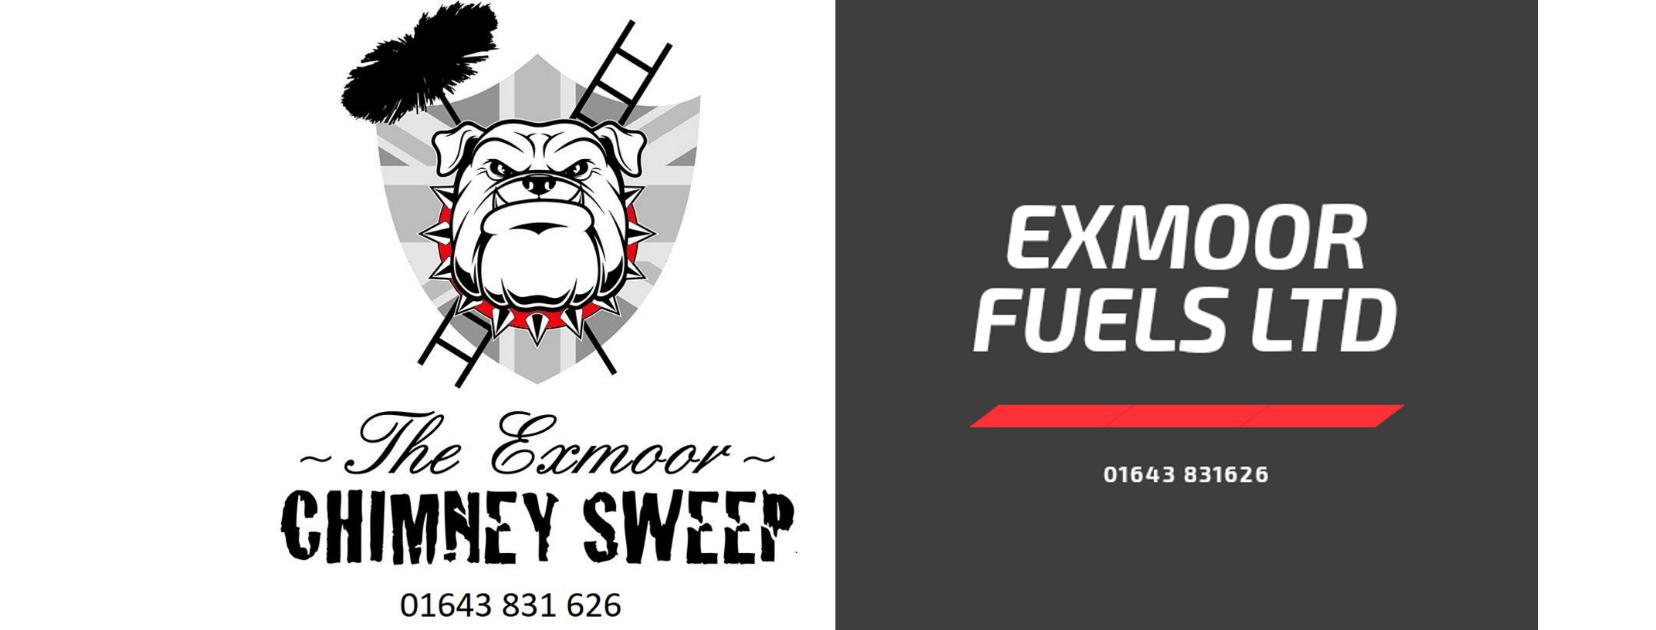 The Exmoor Chimney Sweep